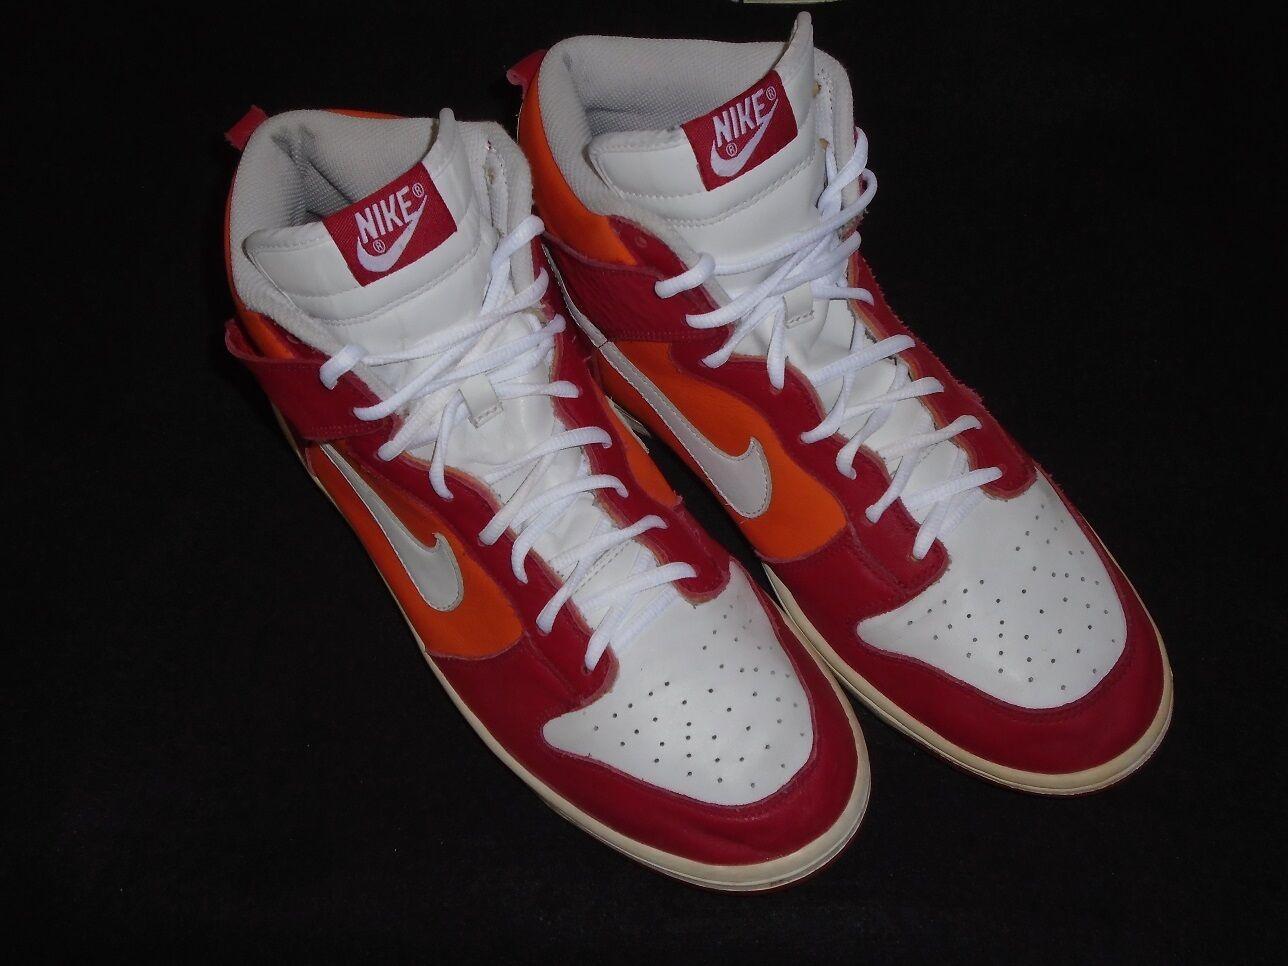 2018 Nike rojo Dunk High Hola varsity rojo Nike / Blanco-Naranja Blaze 309432-612 tamaño 13 8a0ee9